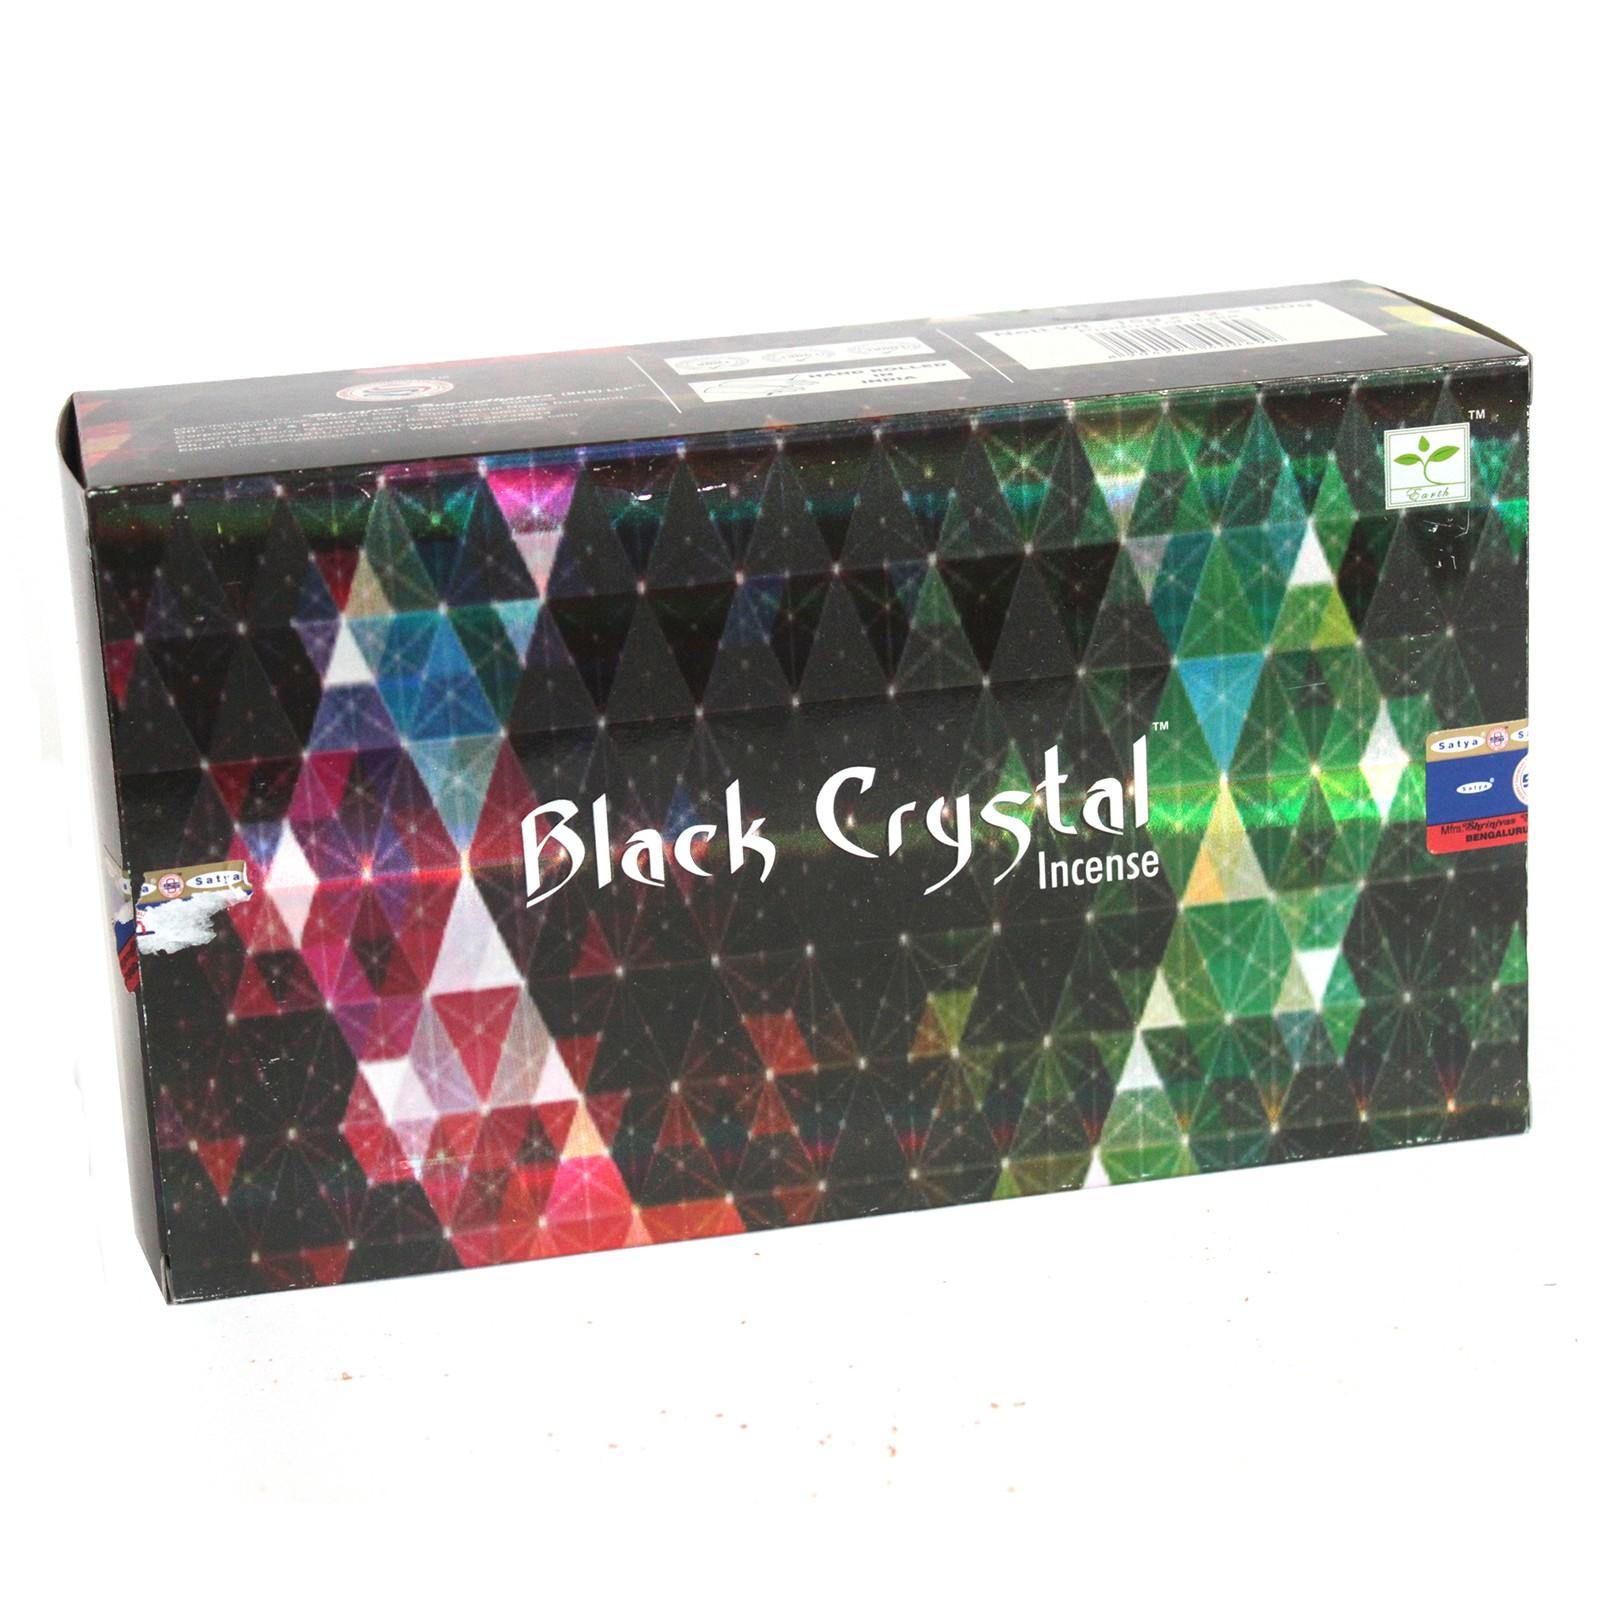 Satya Black Crystal Incense - 15gram - AW Dropship - Your ...